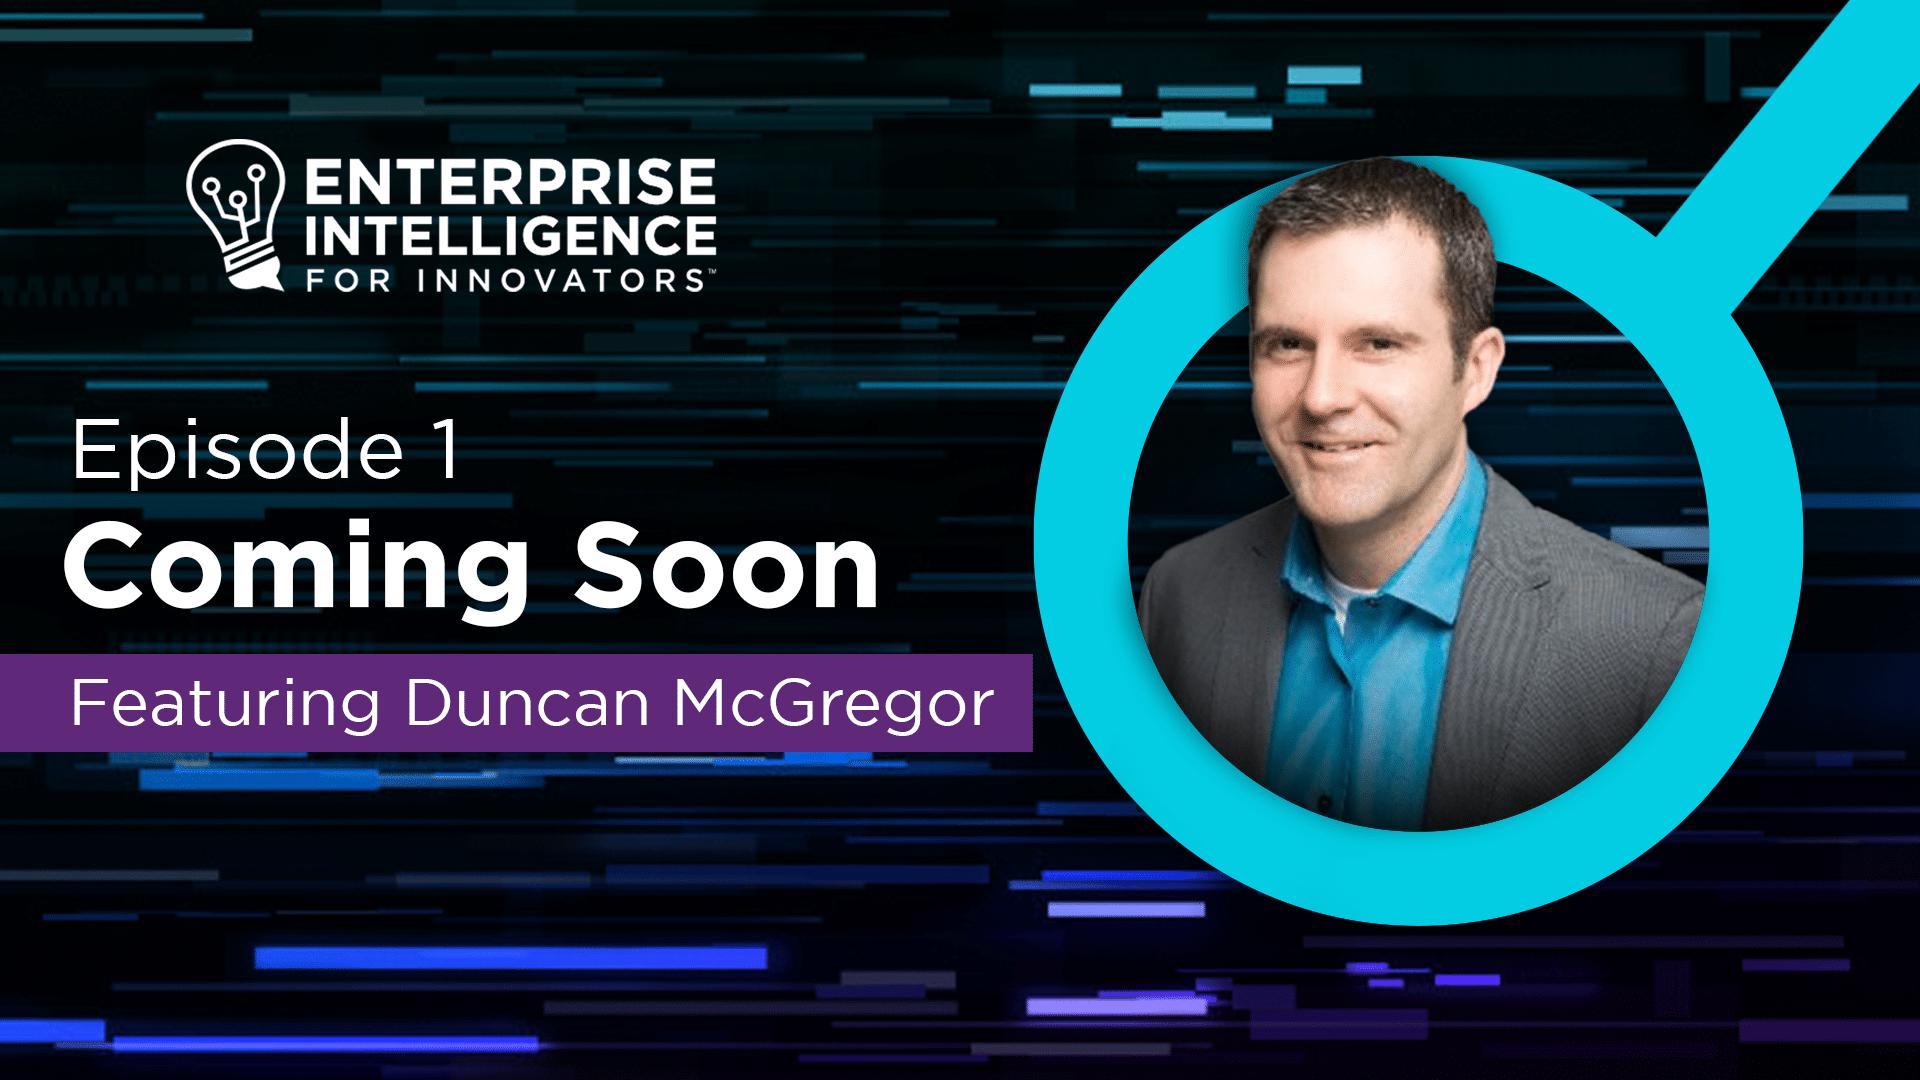 Episode 1: Duncan McGregor VP Engineering & Operations at TeraGo